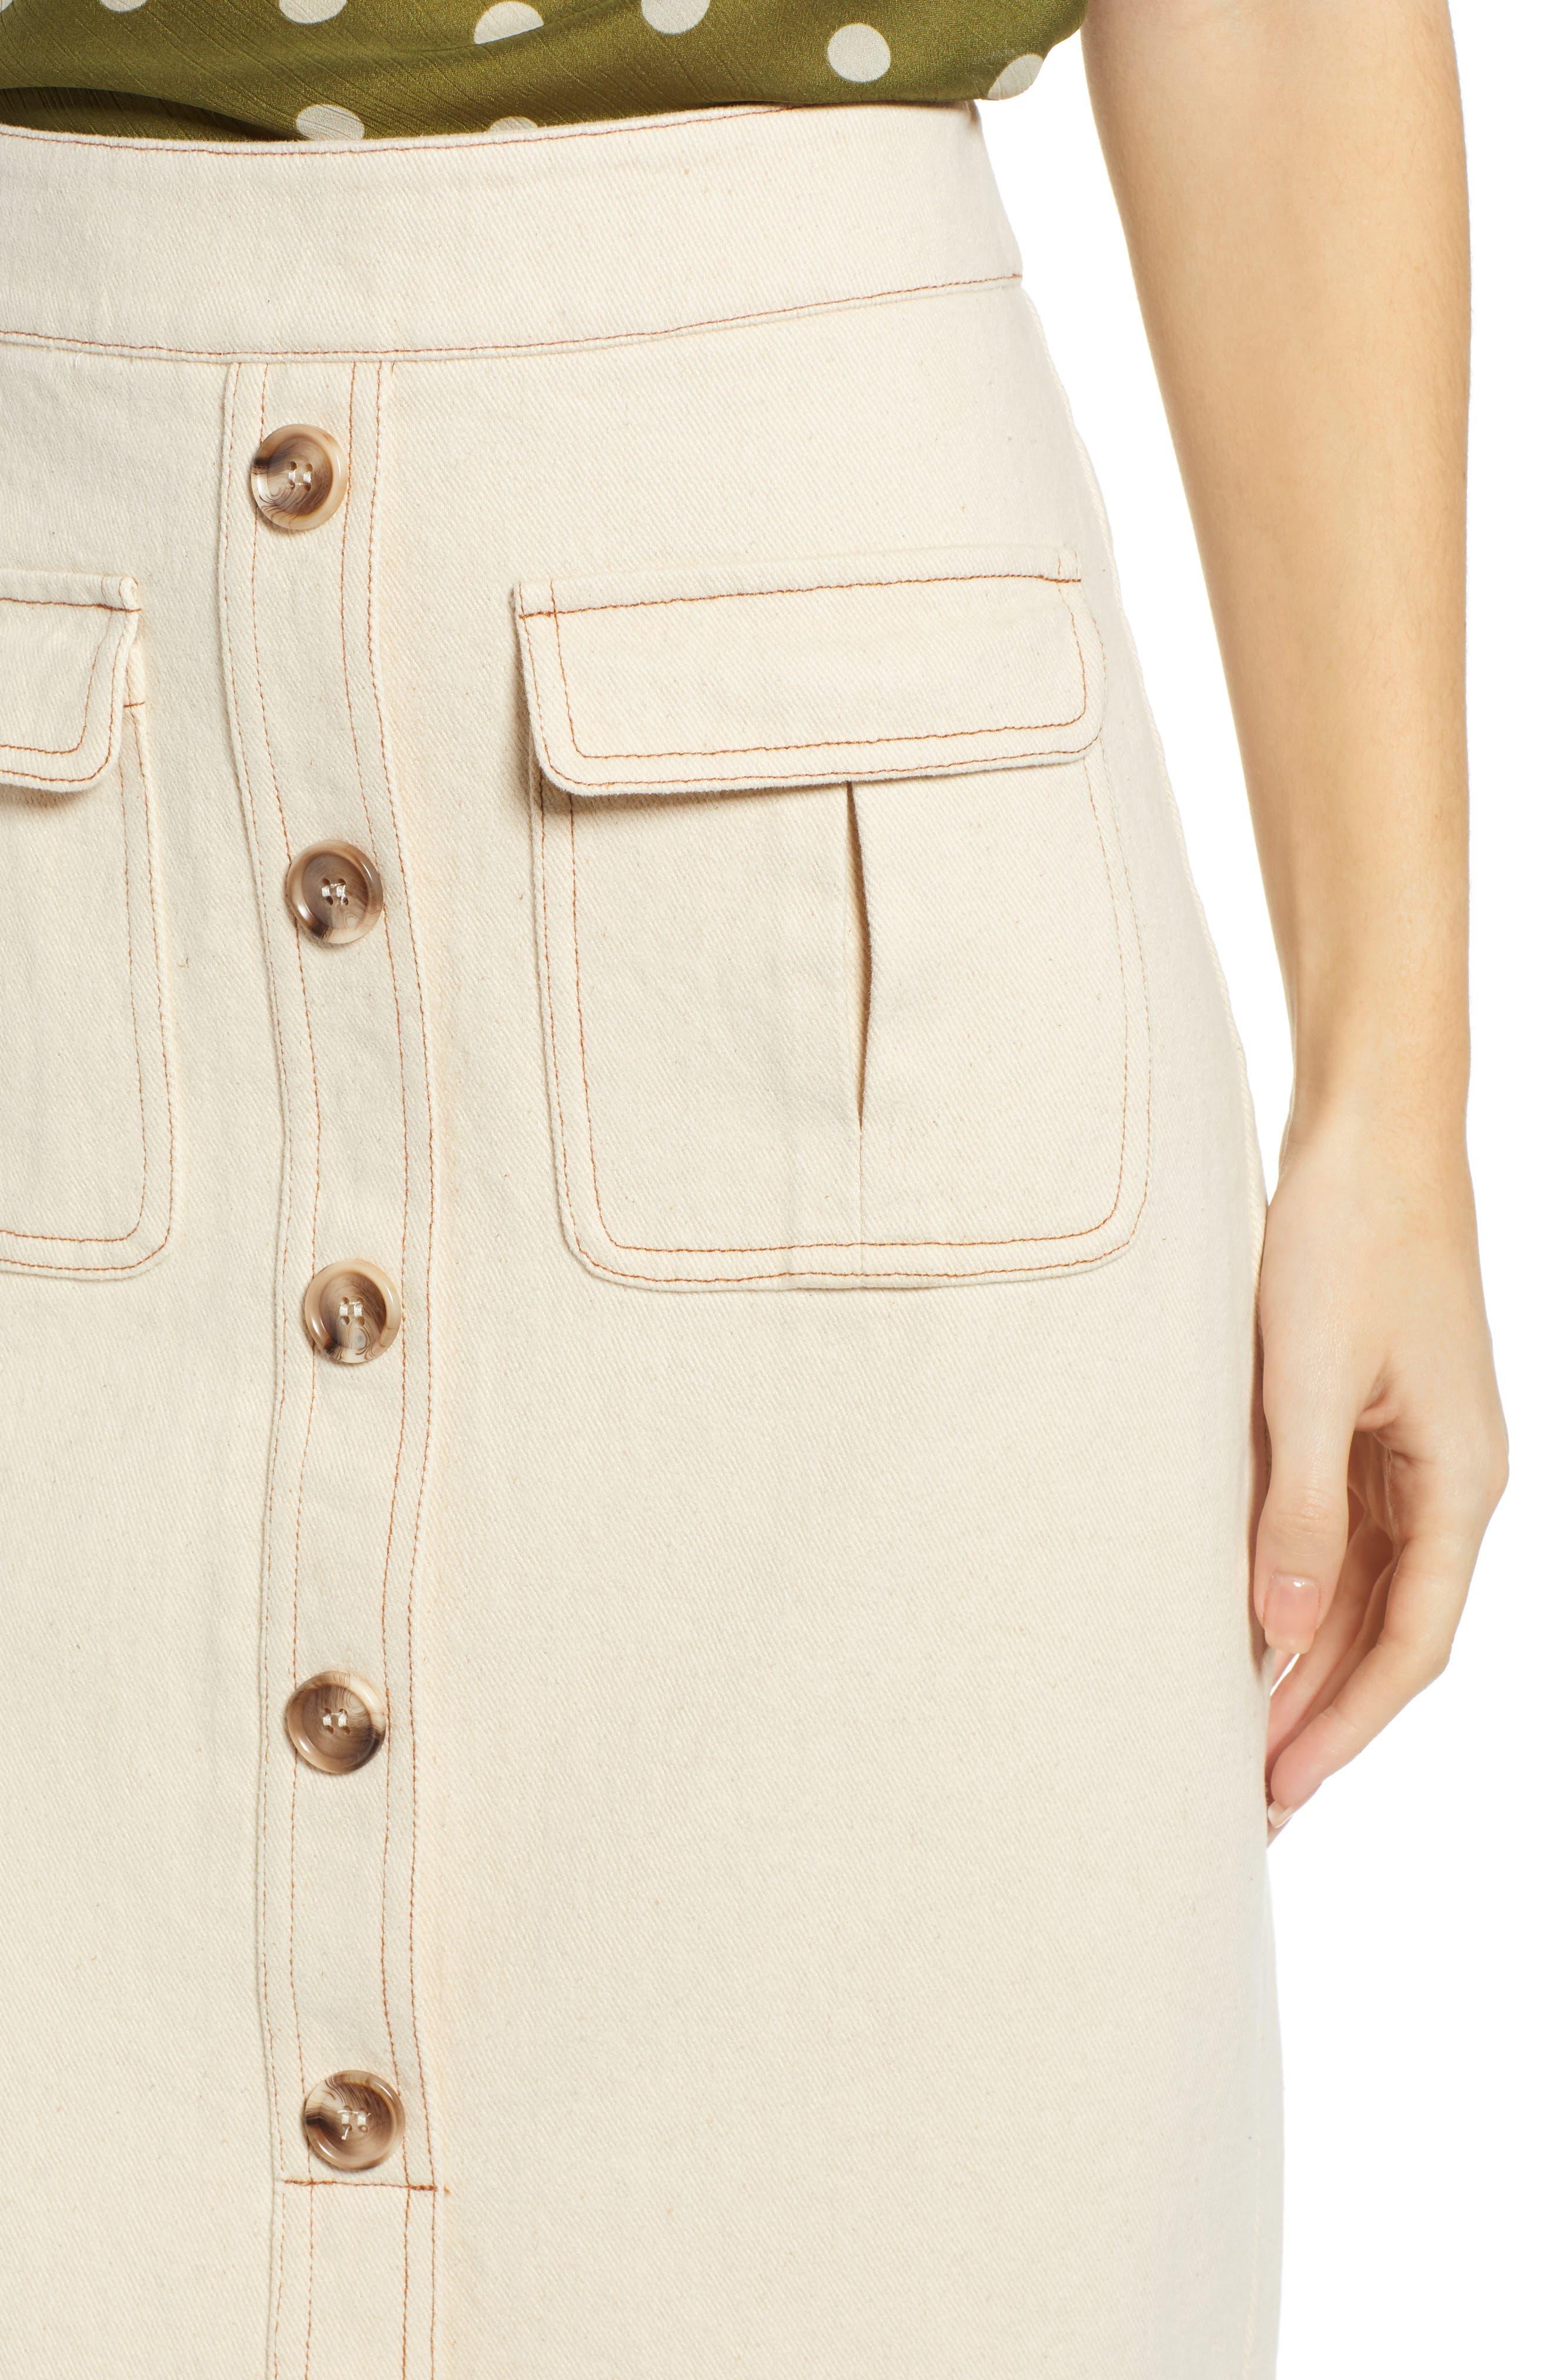 CHRISELLE LIM COLLECTION, Chriselle Lim Marine Midi Skirt, Alternate thumbnail 4, color, BONE